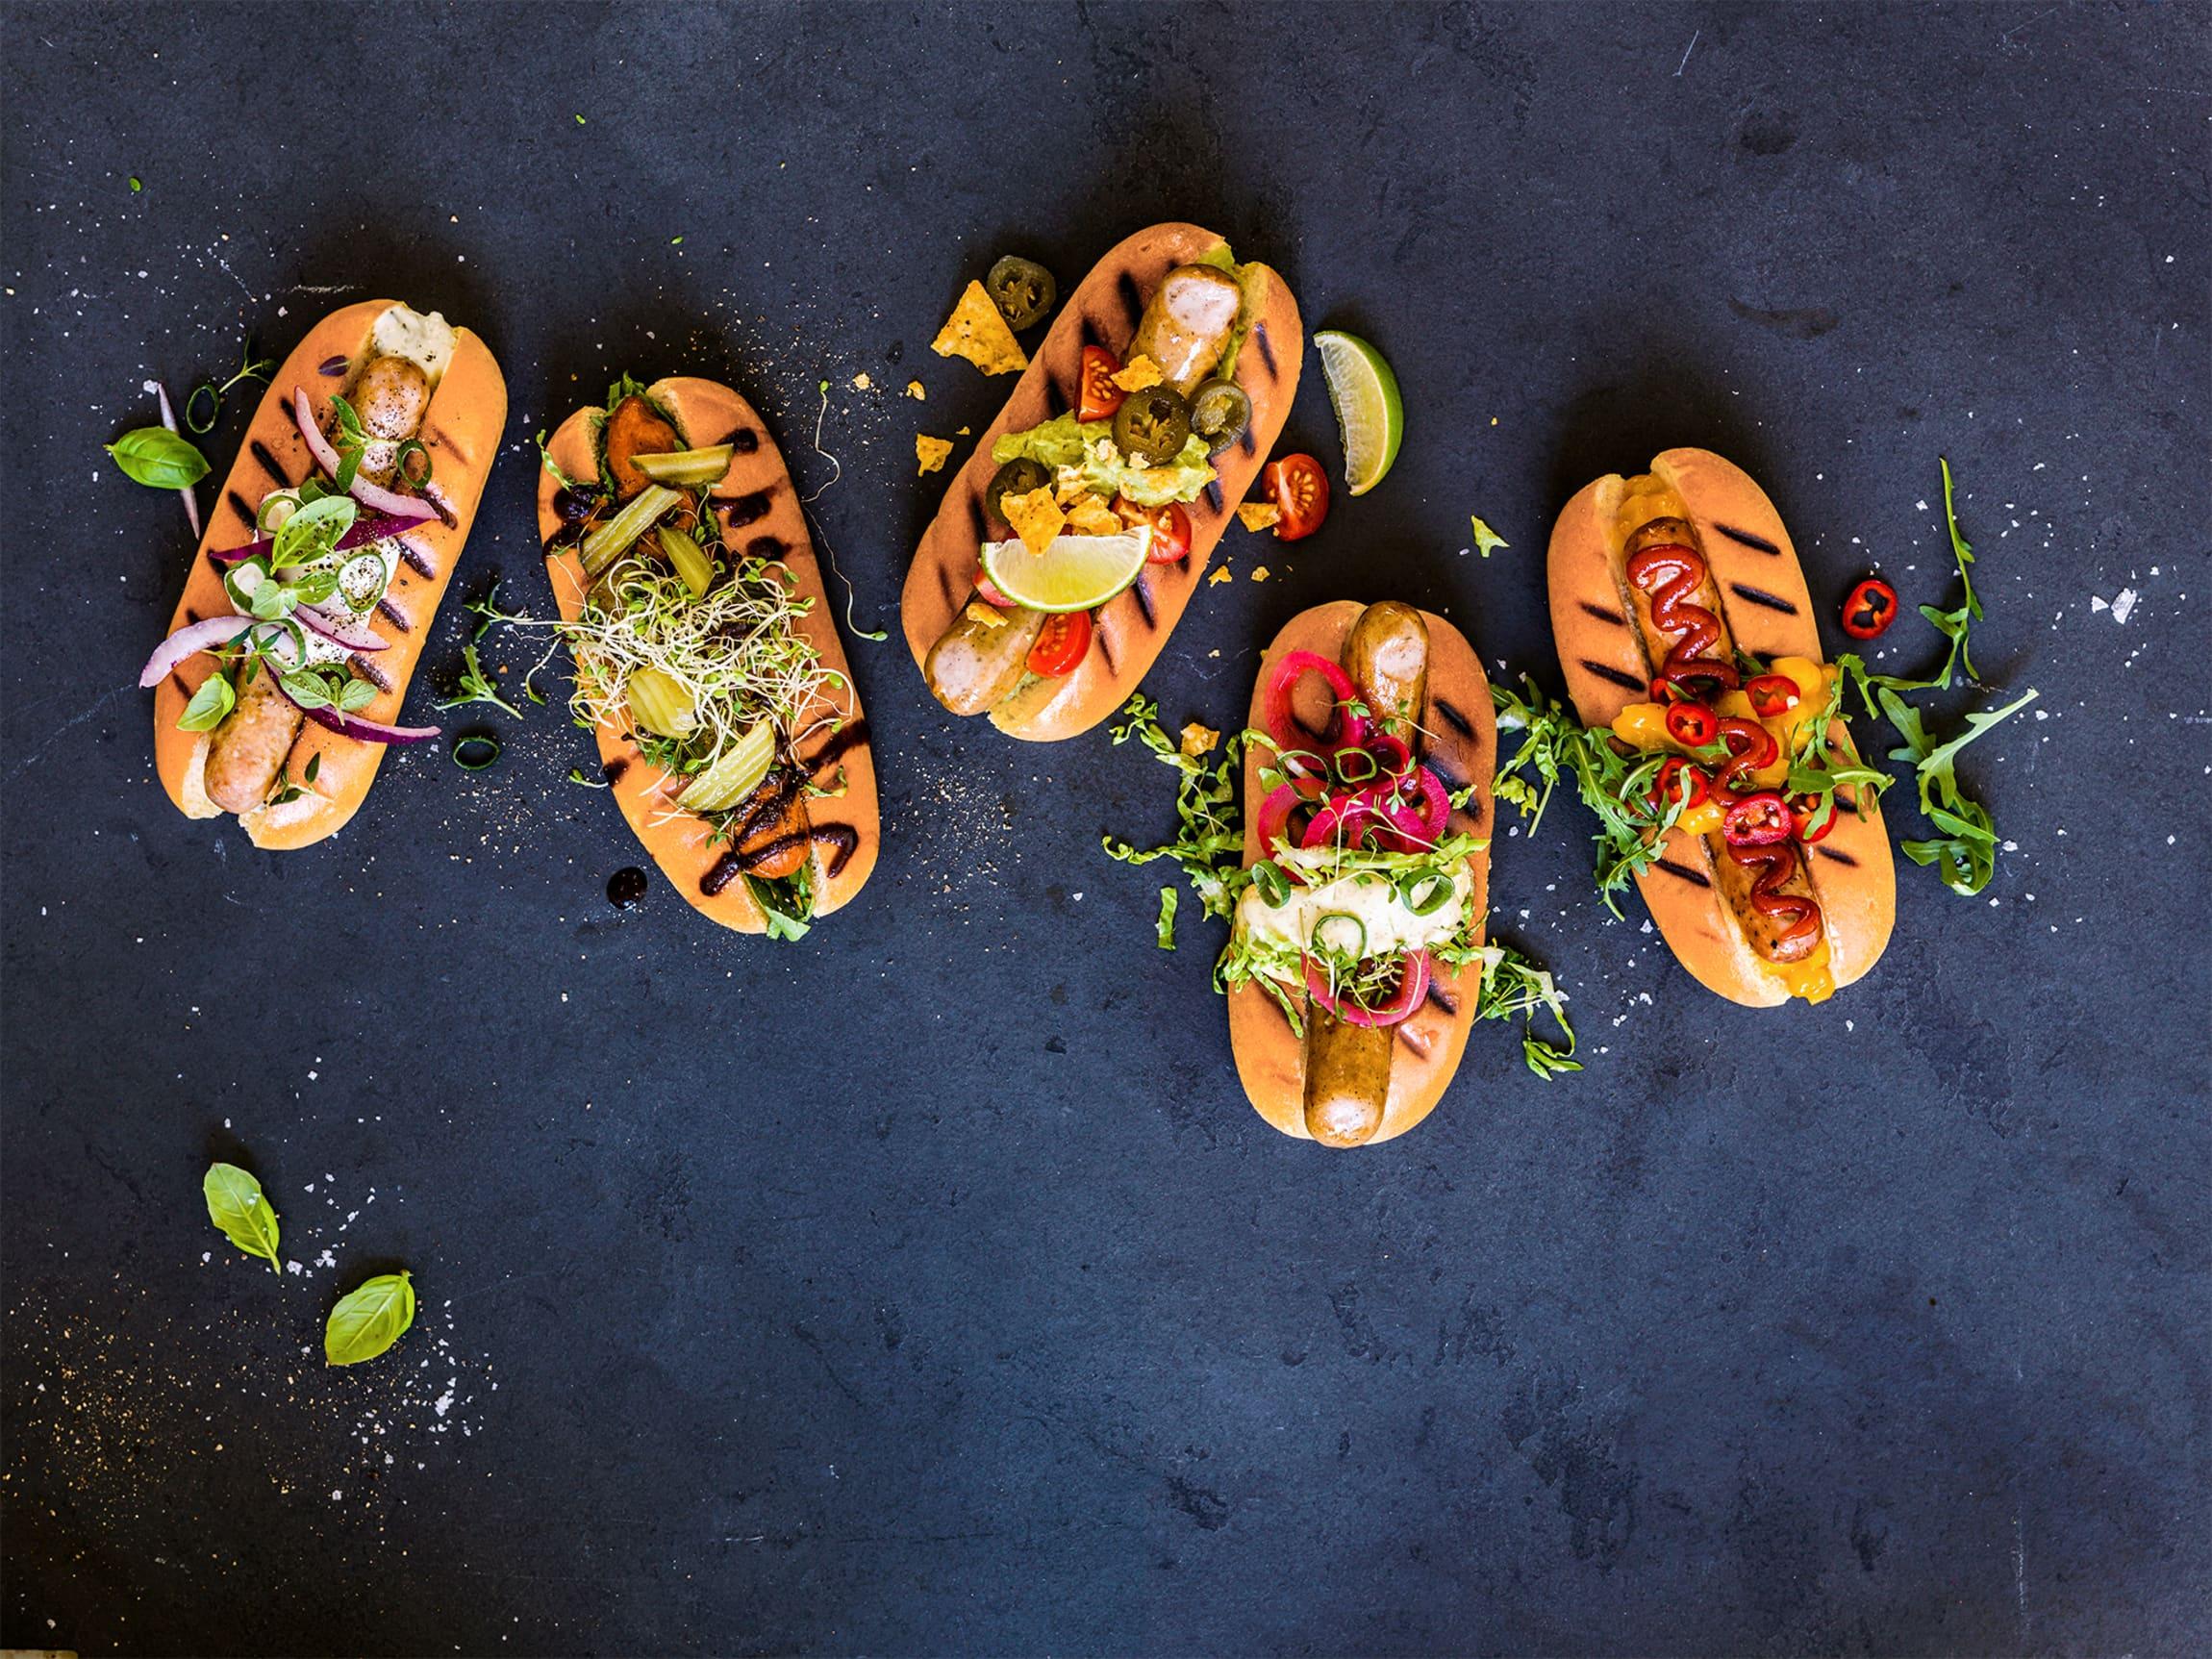 En pølse kan fint være en velsmakende middag! Topp den med syltet rødløk, coleslaw eller sennep.